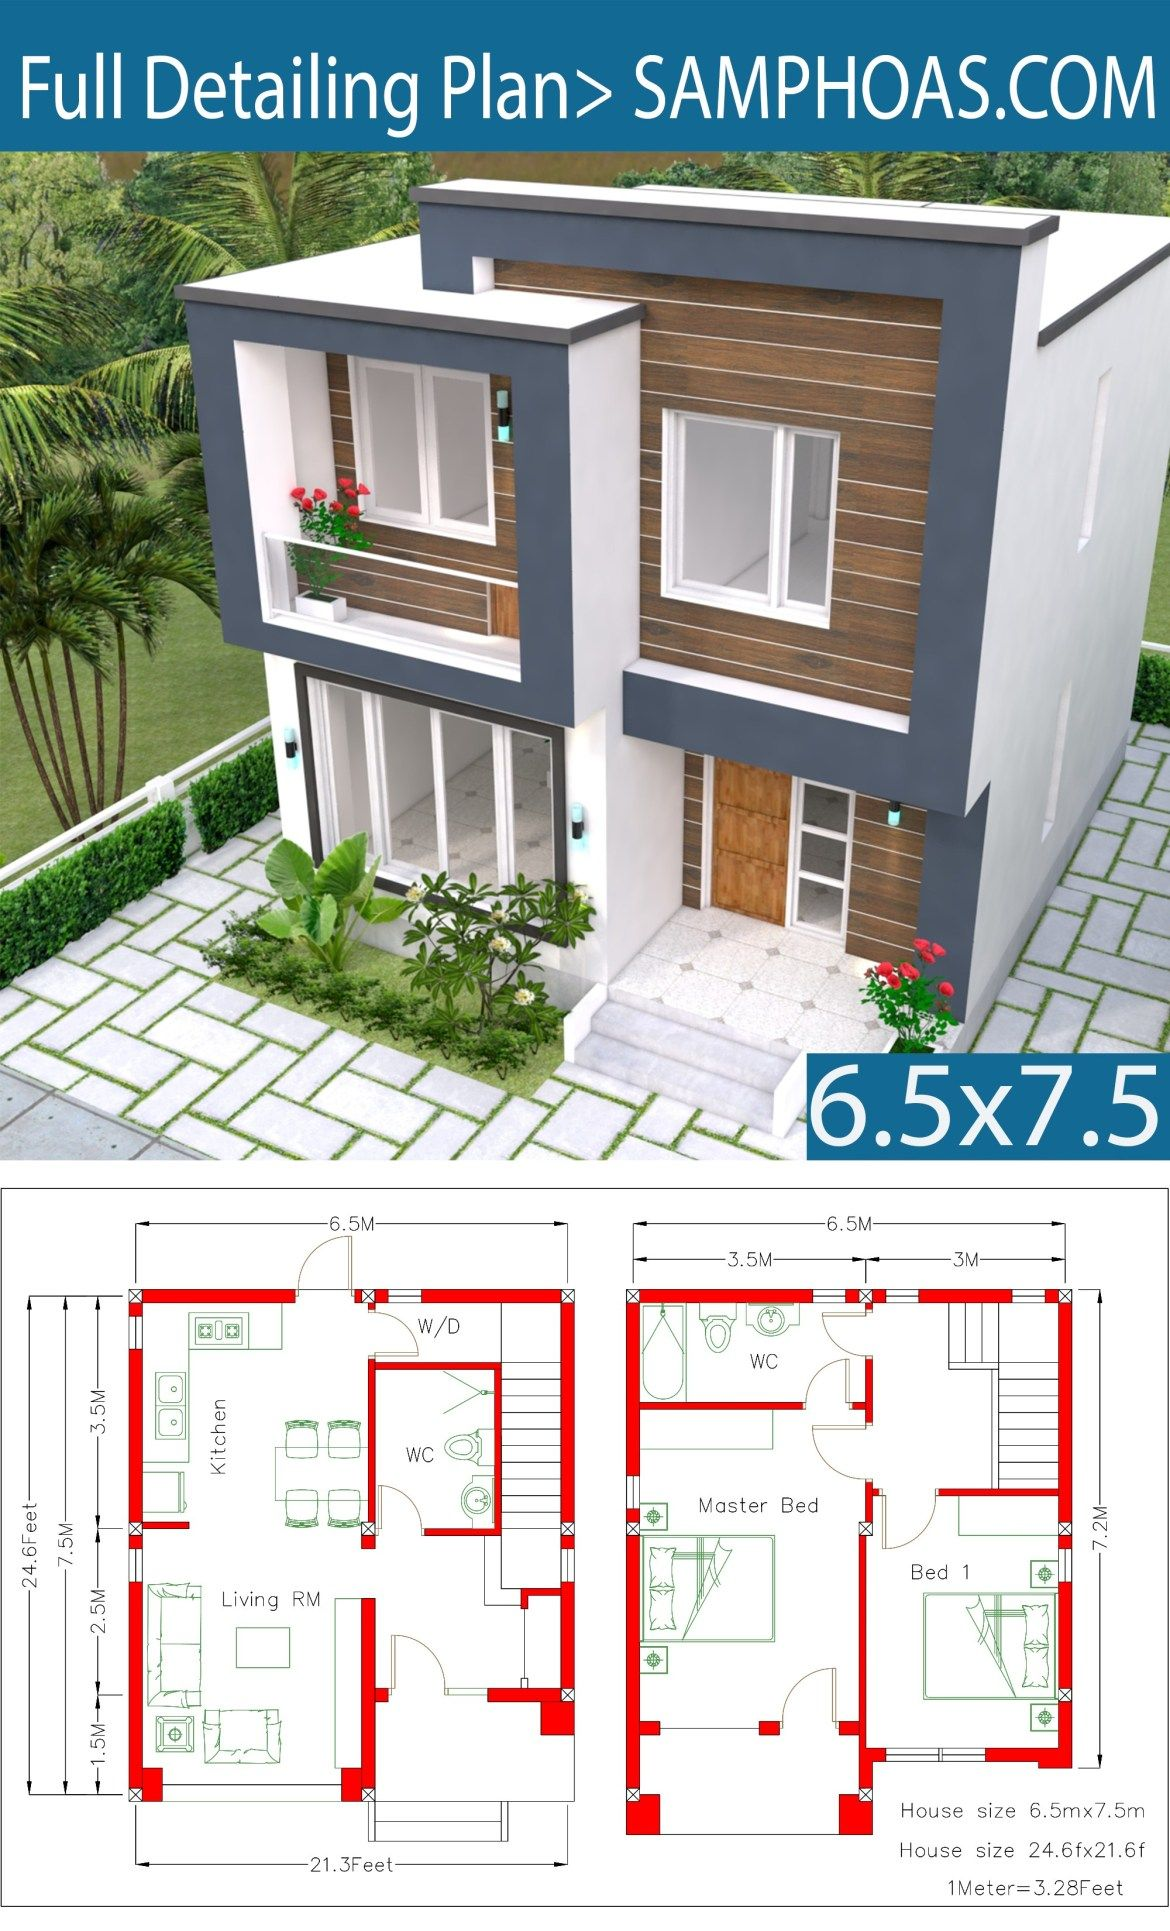 home design plan 6 5x7 5m 2 bedrooms home design with layout plan rh pinterest com